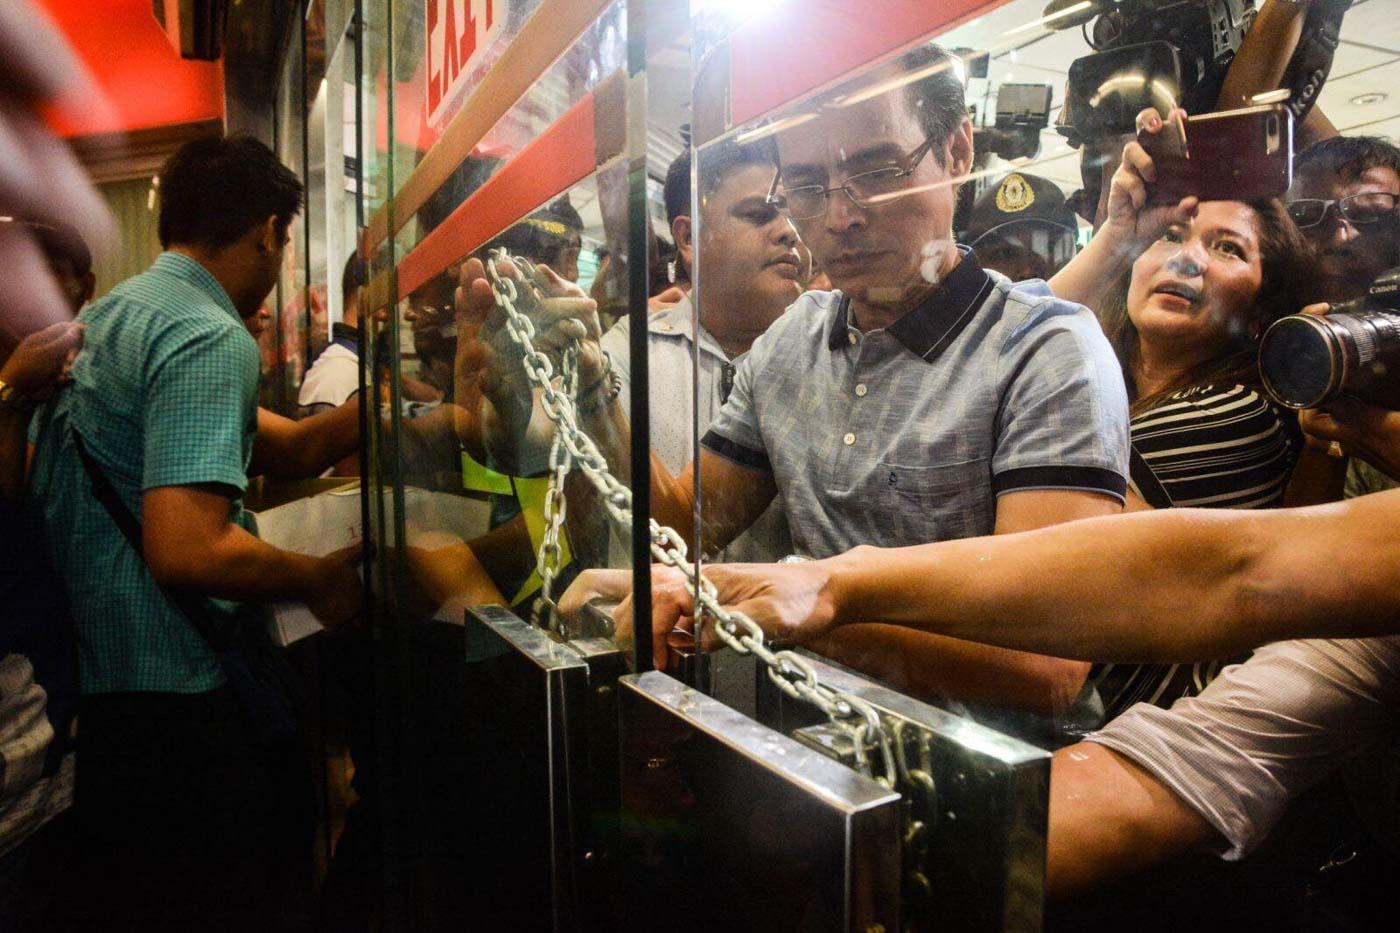 CLOSED. Manila Mayor Isko Moreno serves the closure order against Isetann mall in Recto. Manila PIO photo